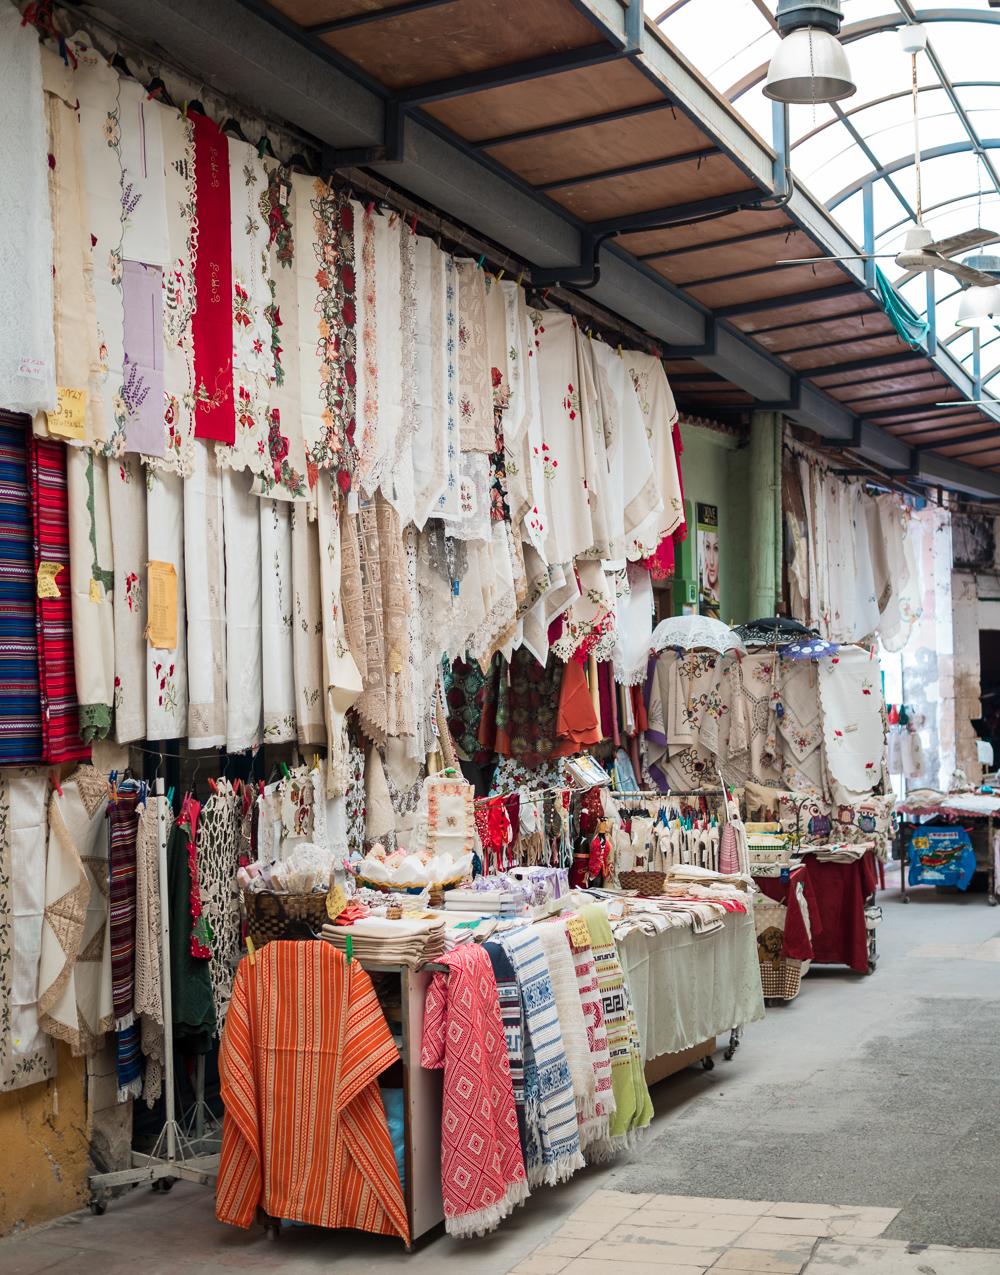 Paphos covered market